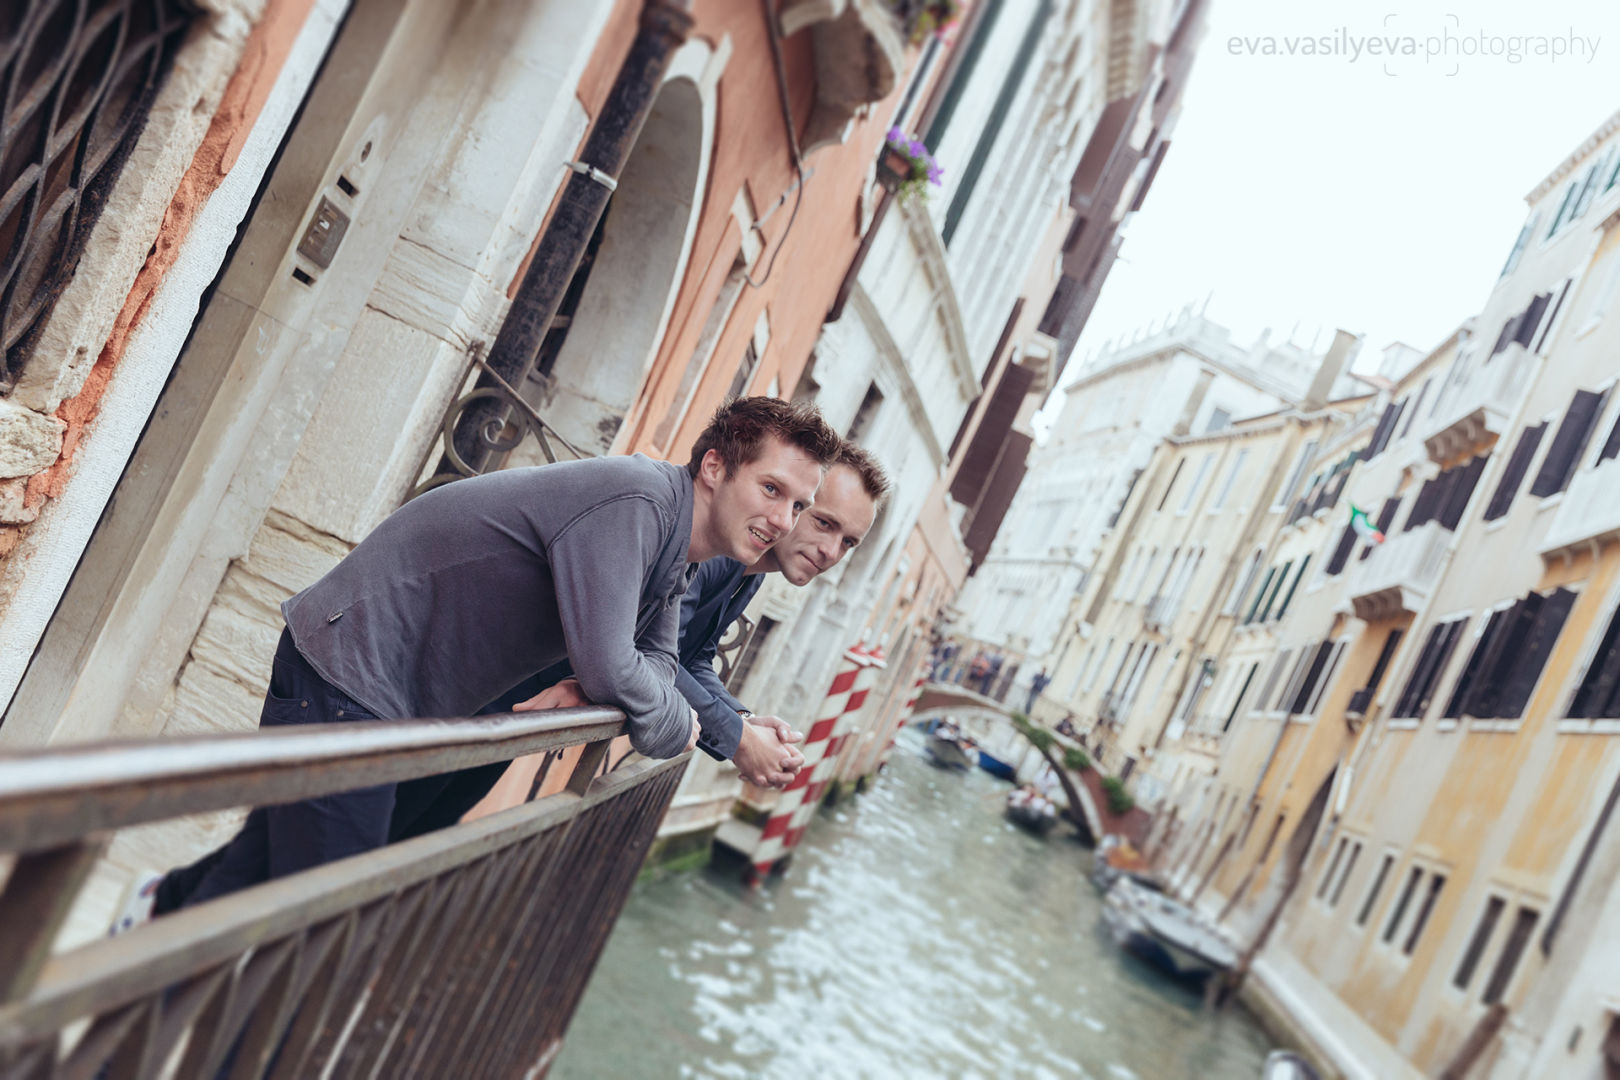 Venice_2015-05-05_049_retouch_logo